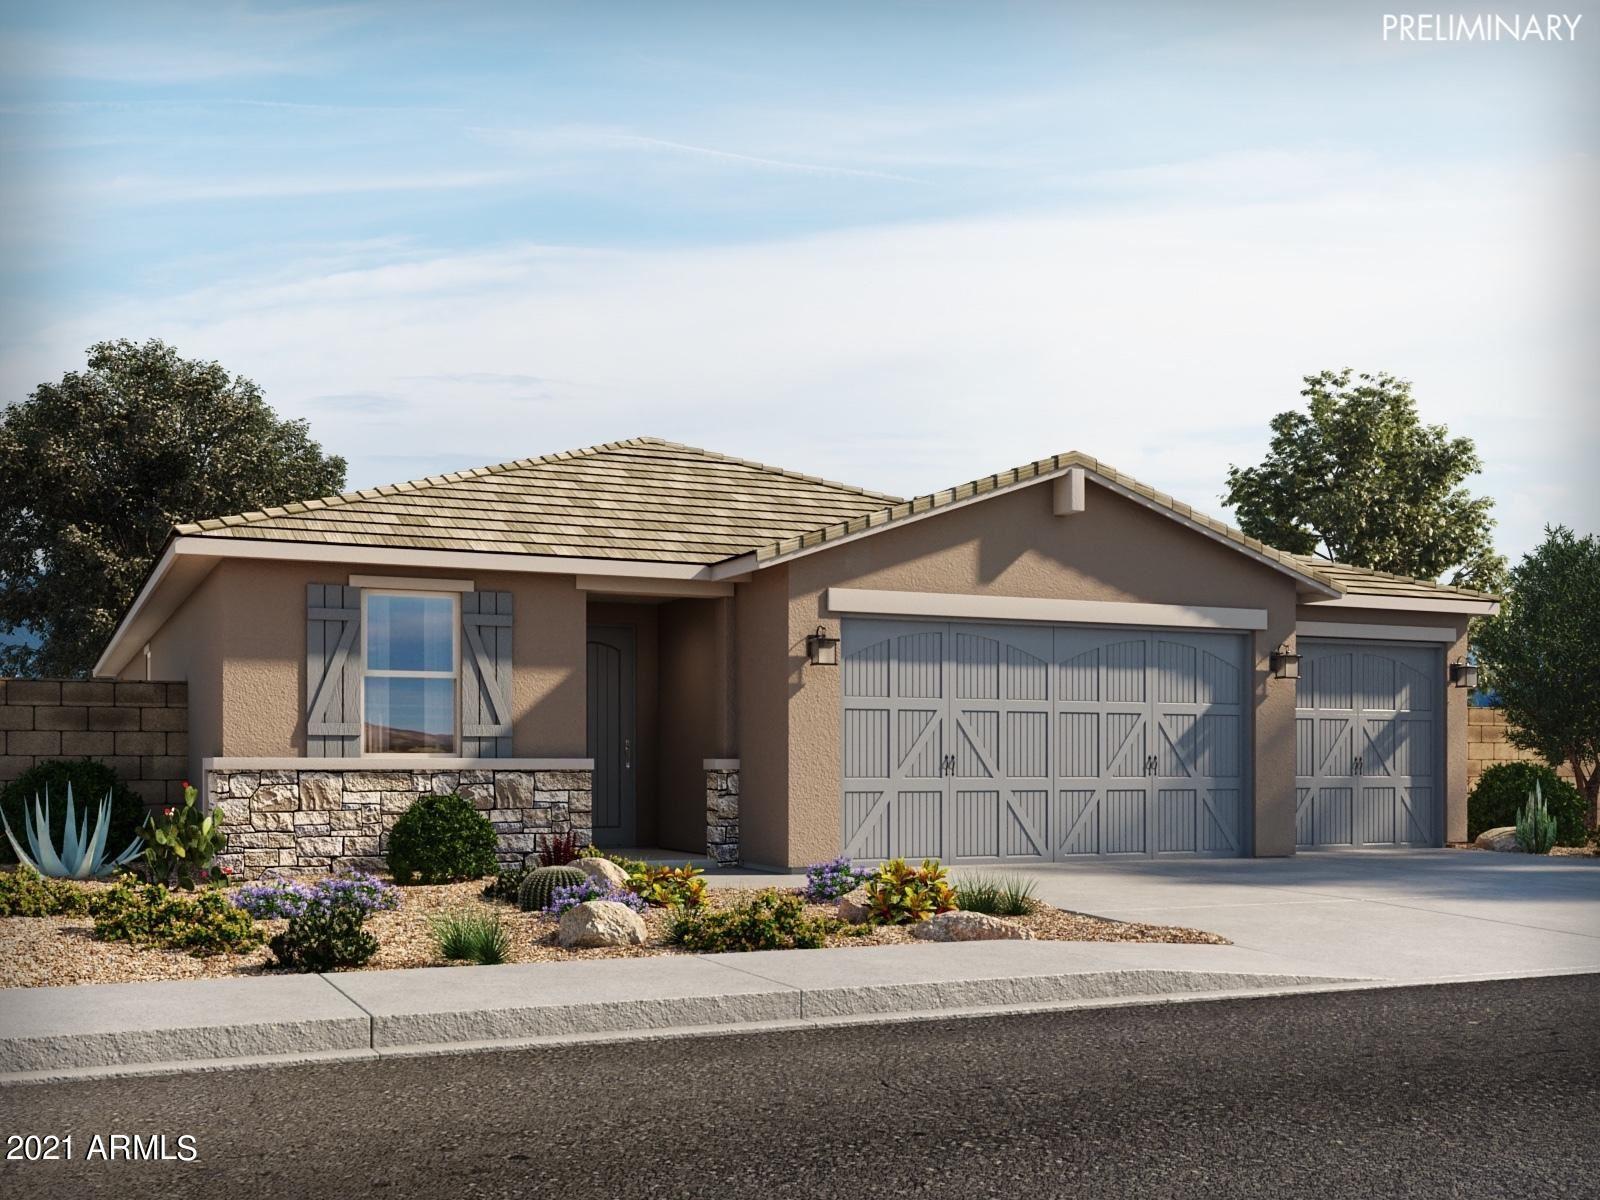 19878 N LAUREN Road, Maricopa, AZ 85138 - MLS#: 6181590